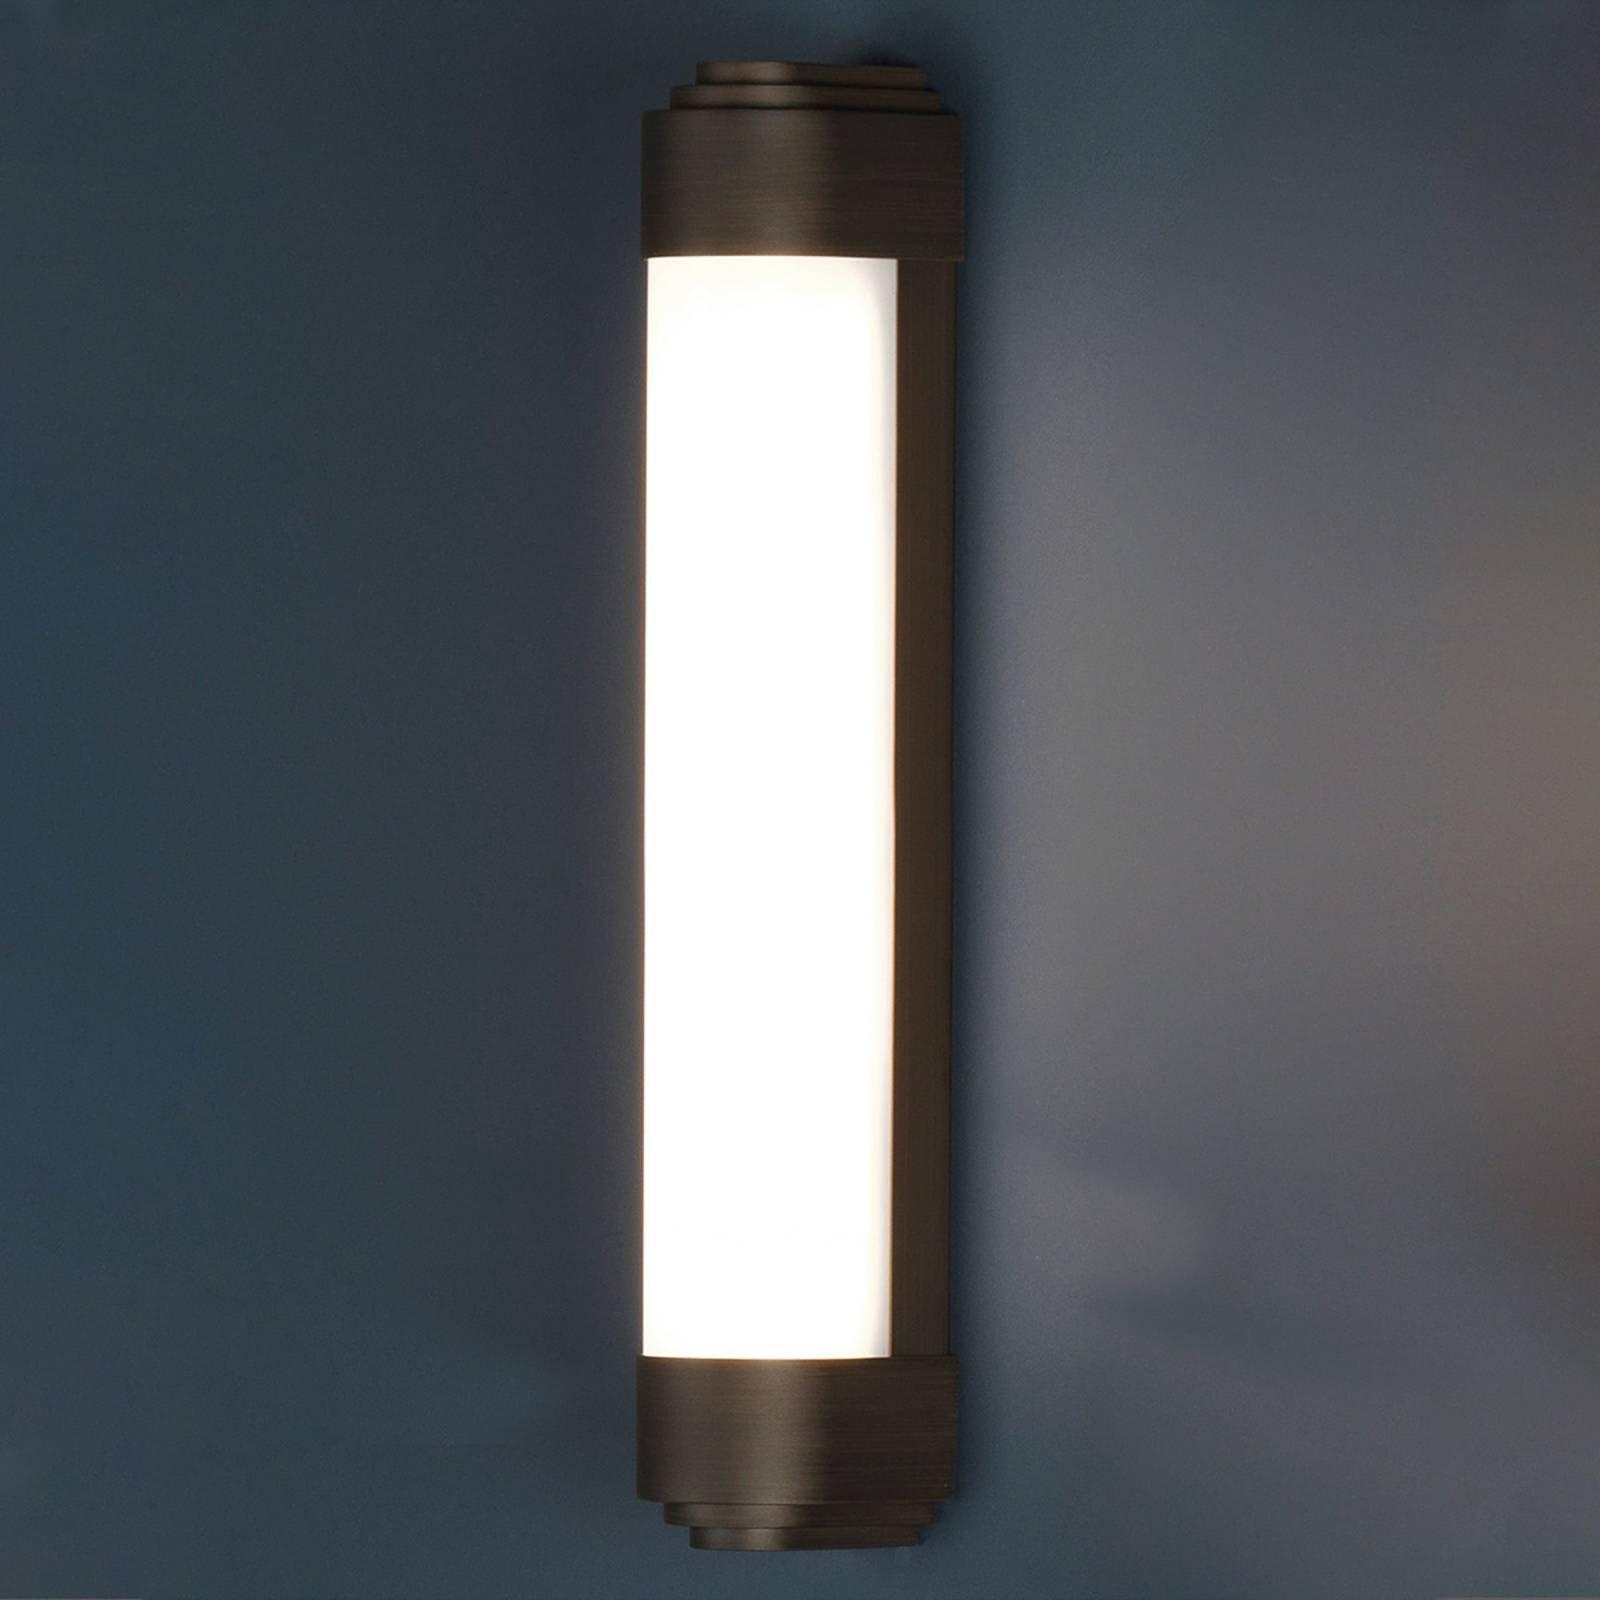 Astro Belgravia LED-vegglampe, 60 cm